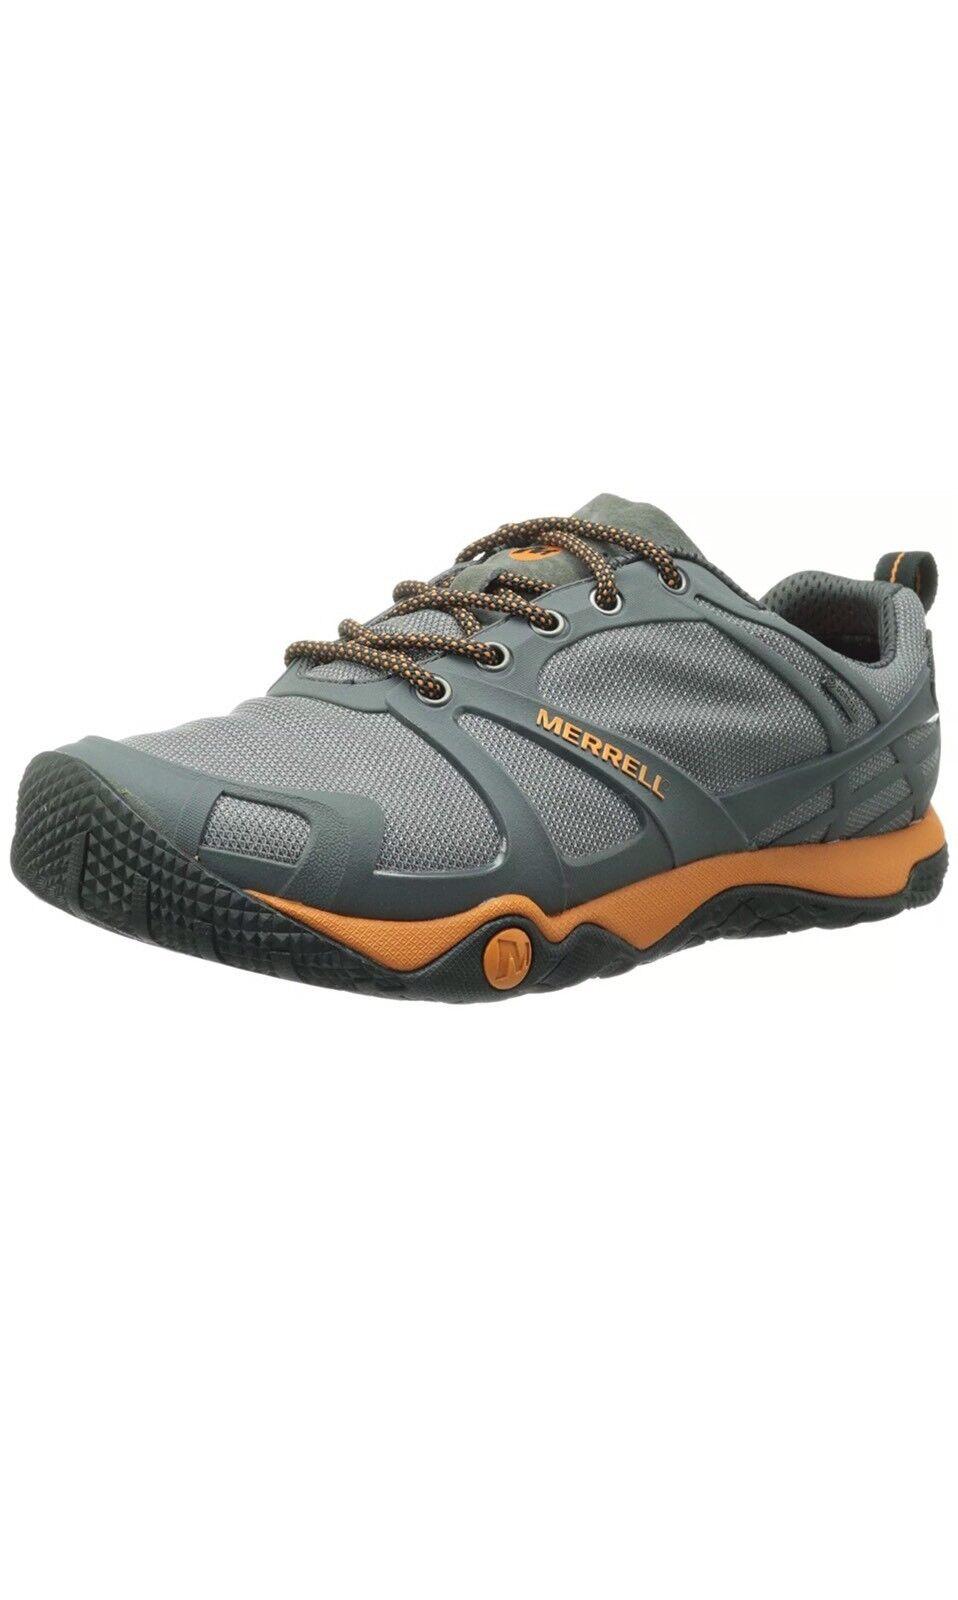 Merrell Hombre  Projoerra Deporte Goretex Impermeable Zapato de senderismo, Paloma Silvestre Tanga, 15M nosotros  conveniente